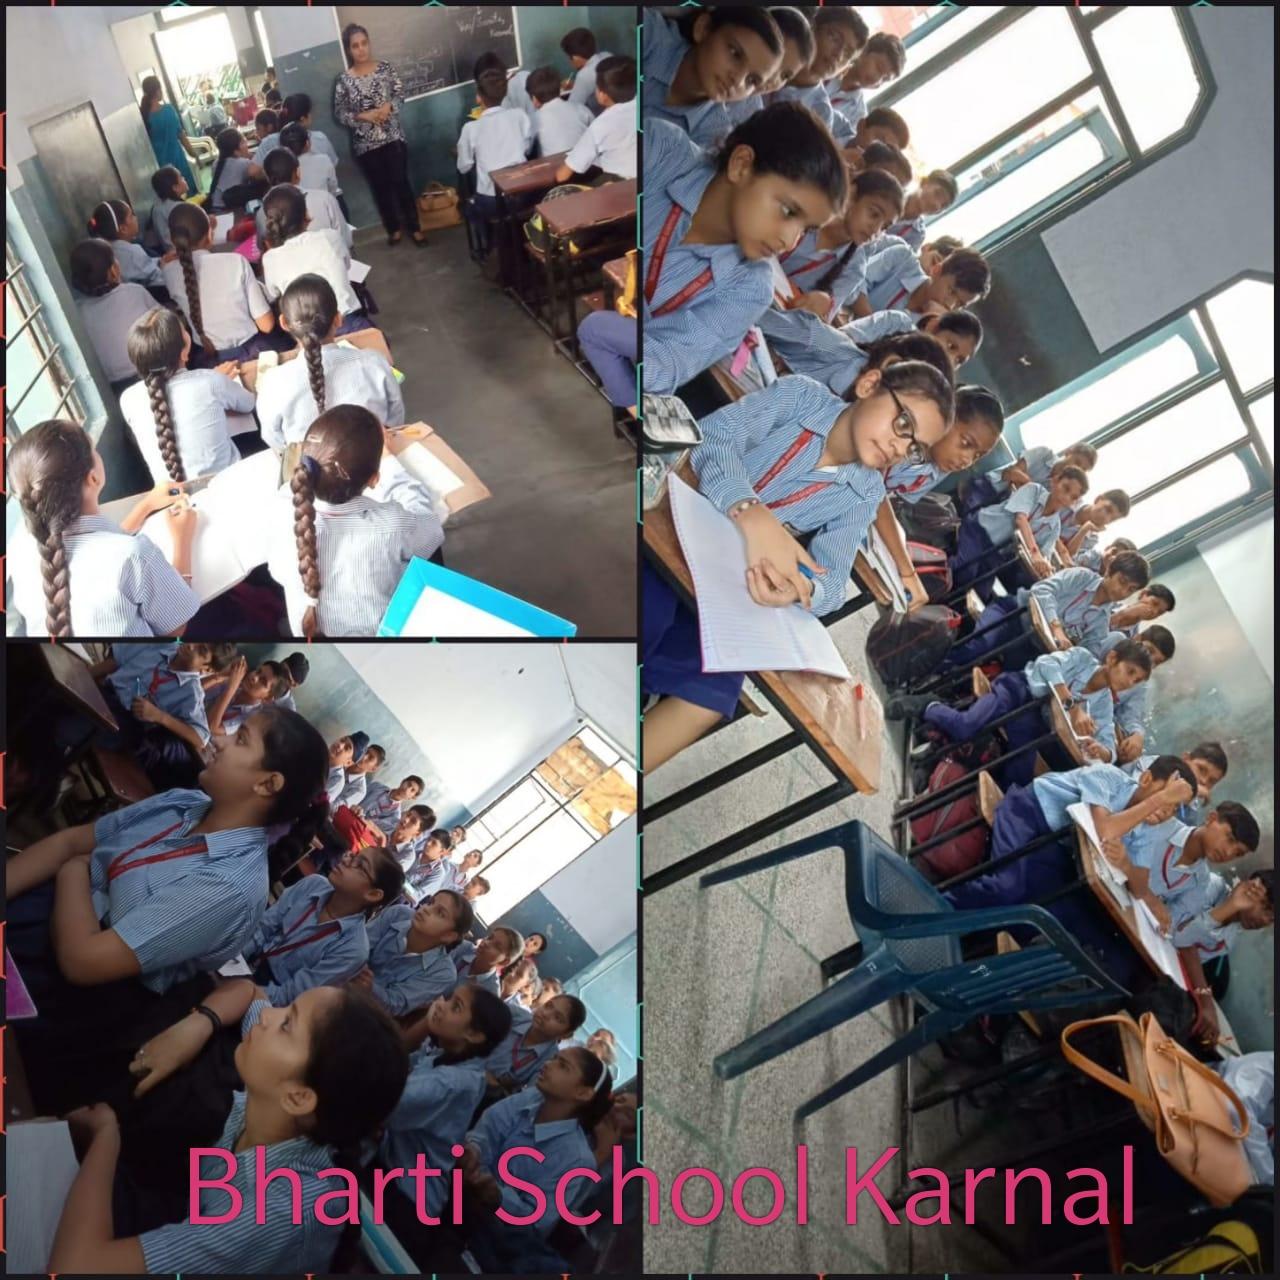 Bharti School Karnal.jpeg